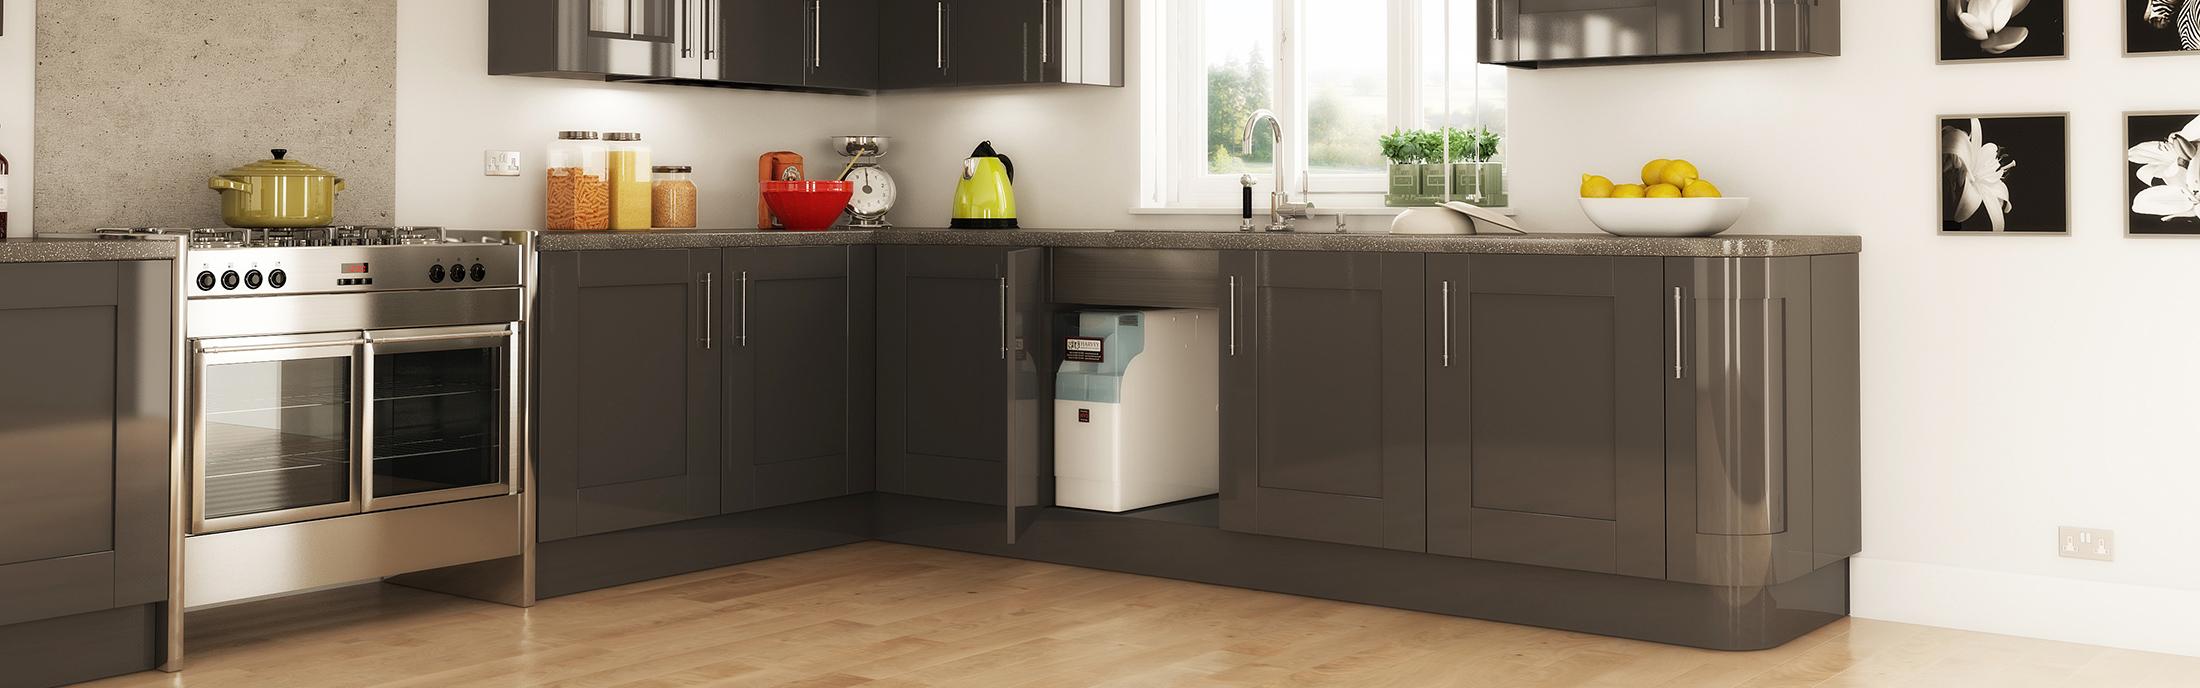 harvey-water-softener-kitchen